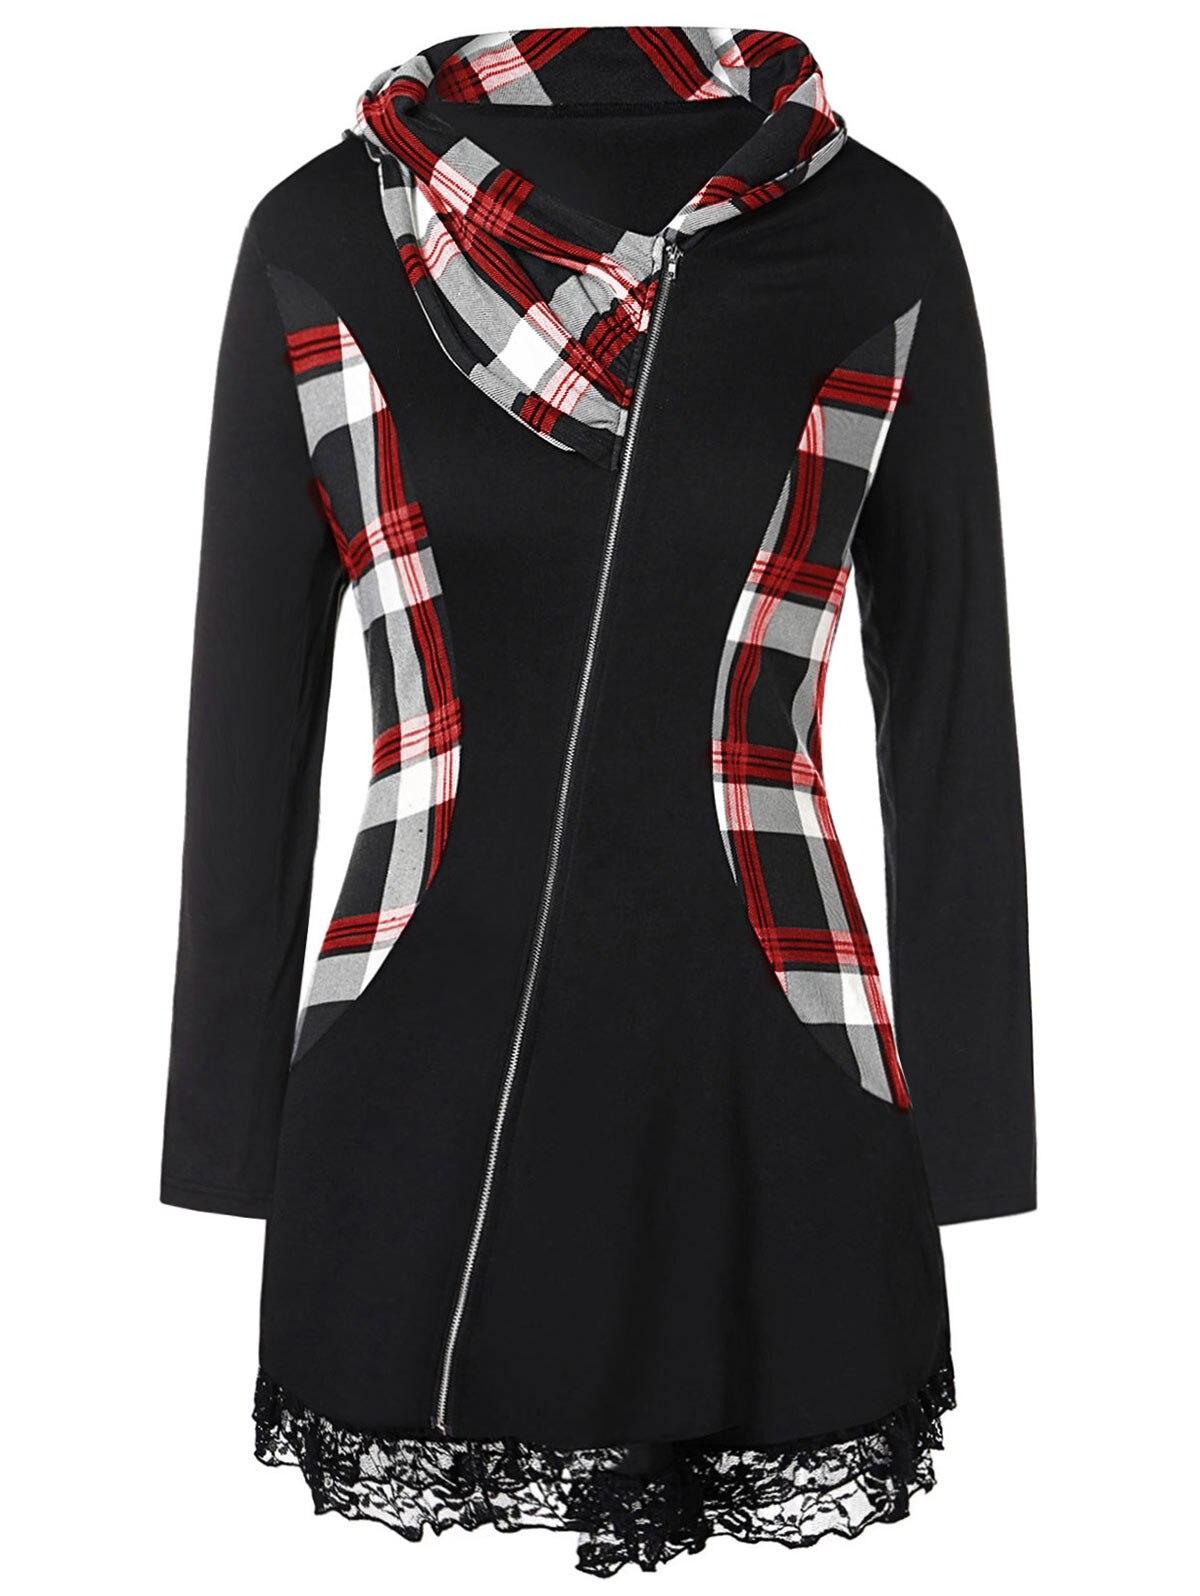 Wipalo Plus Size Lace Insert Plaid Zip Fly Coat Women Jacket Casual Slim Long Sleeves Irregular Coats 2019 Outwear Ladies Tops